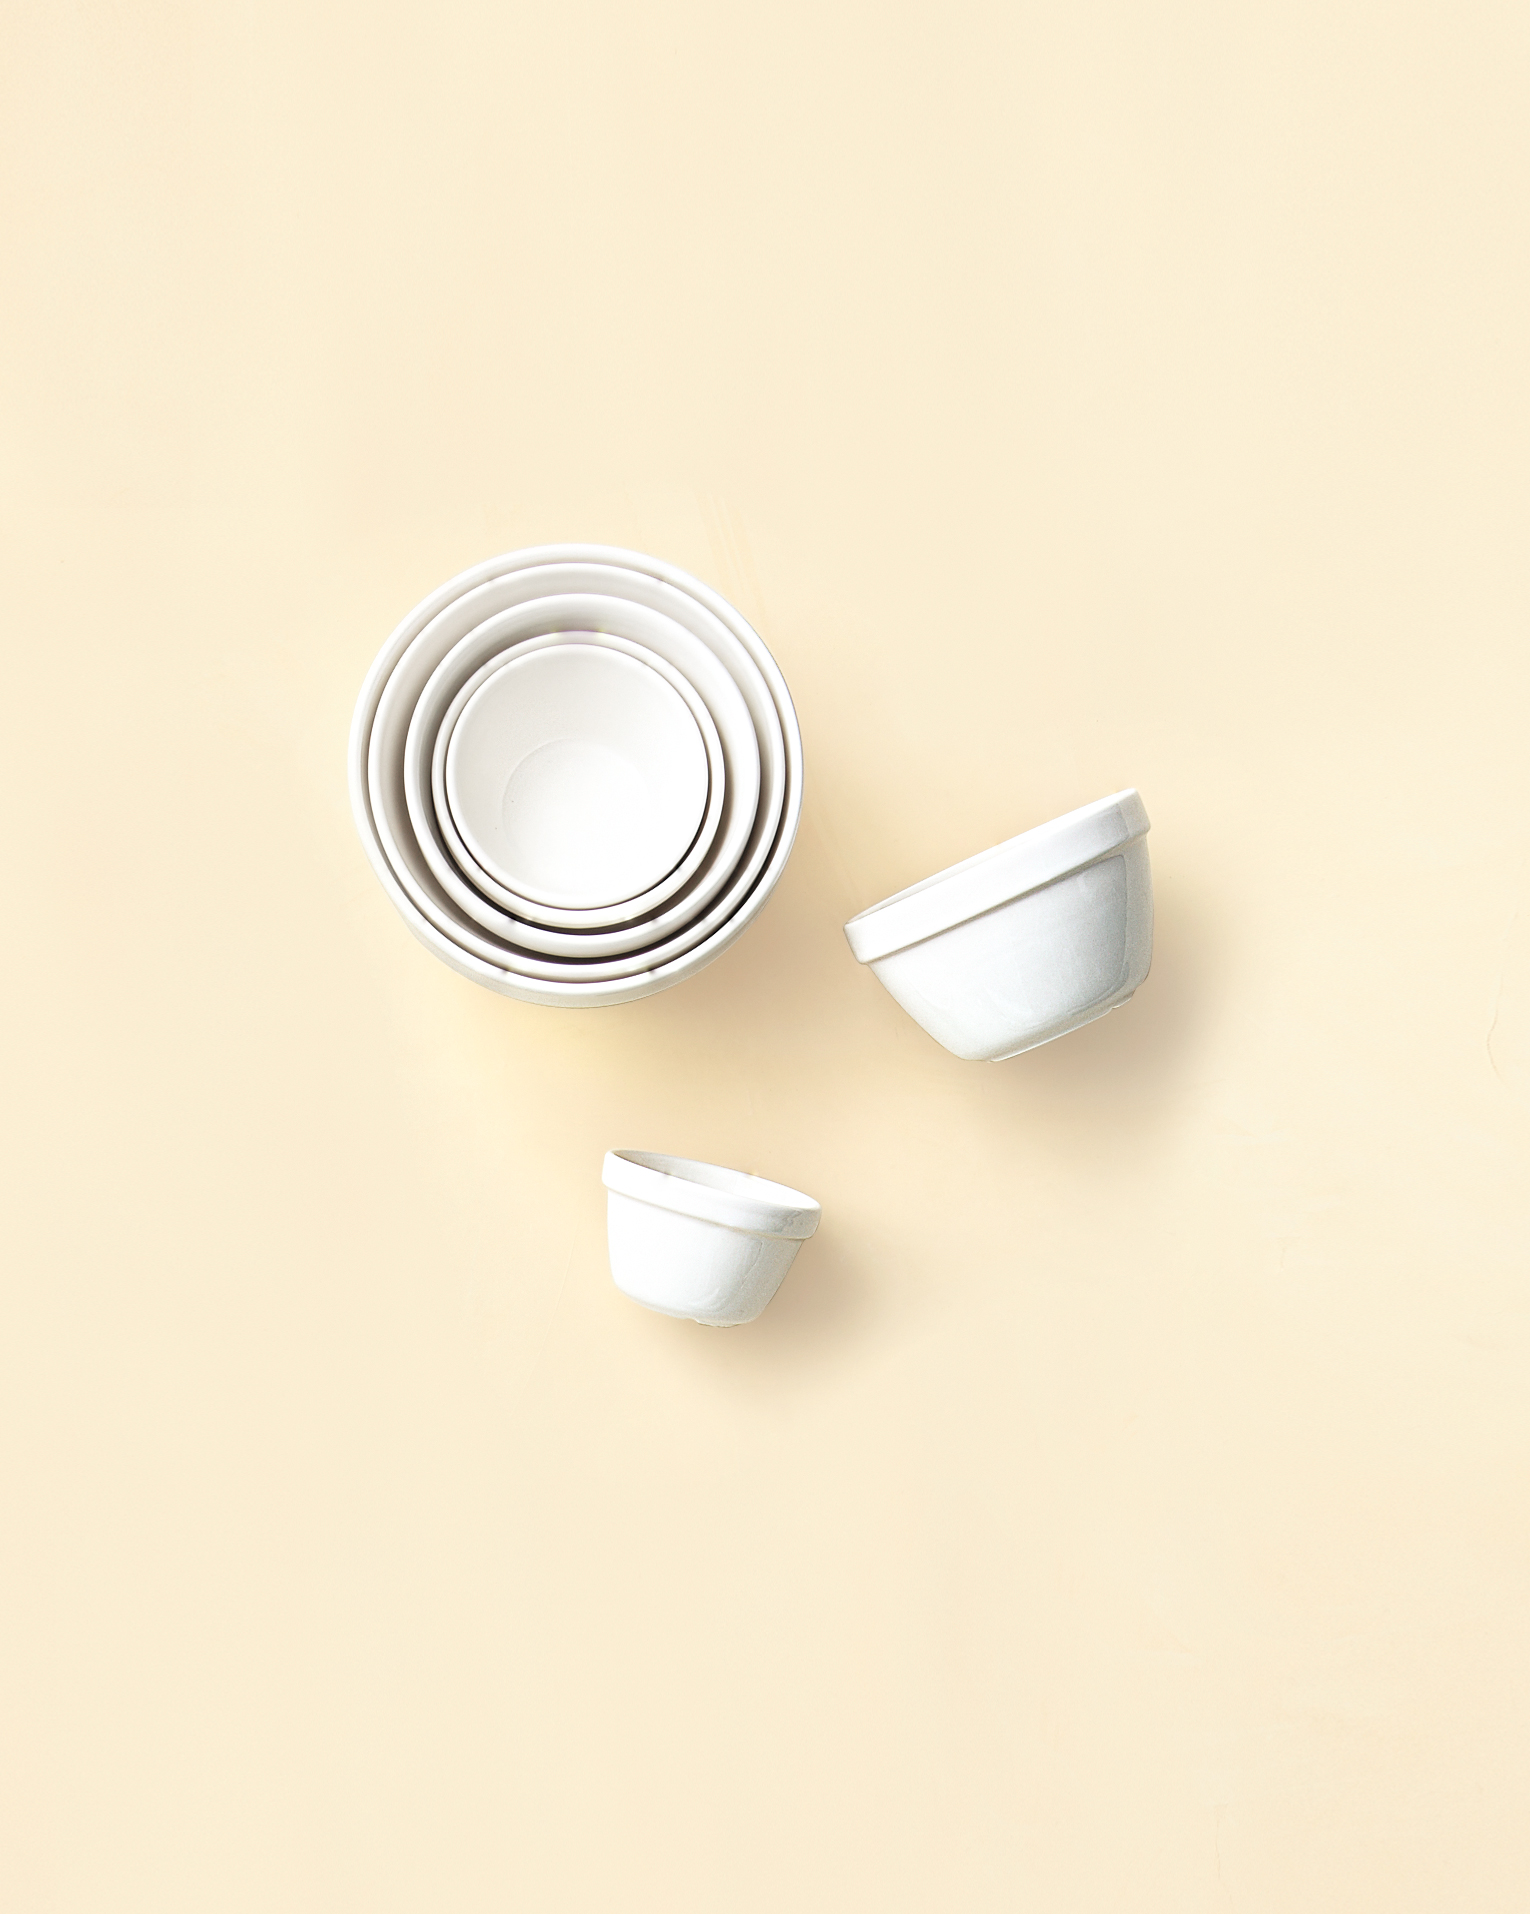 modern-trousseau-pudding-bowl-mwd108878.jpg